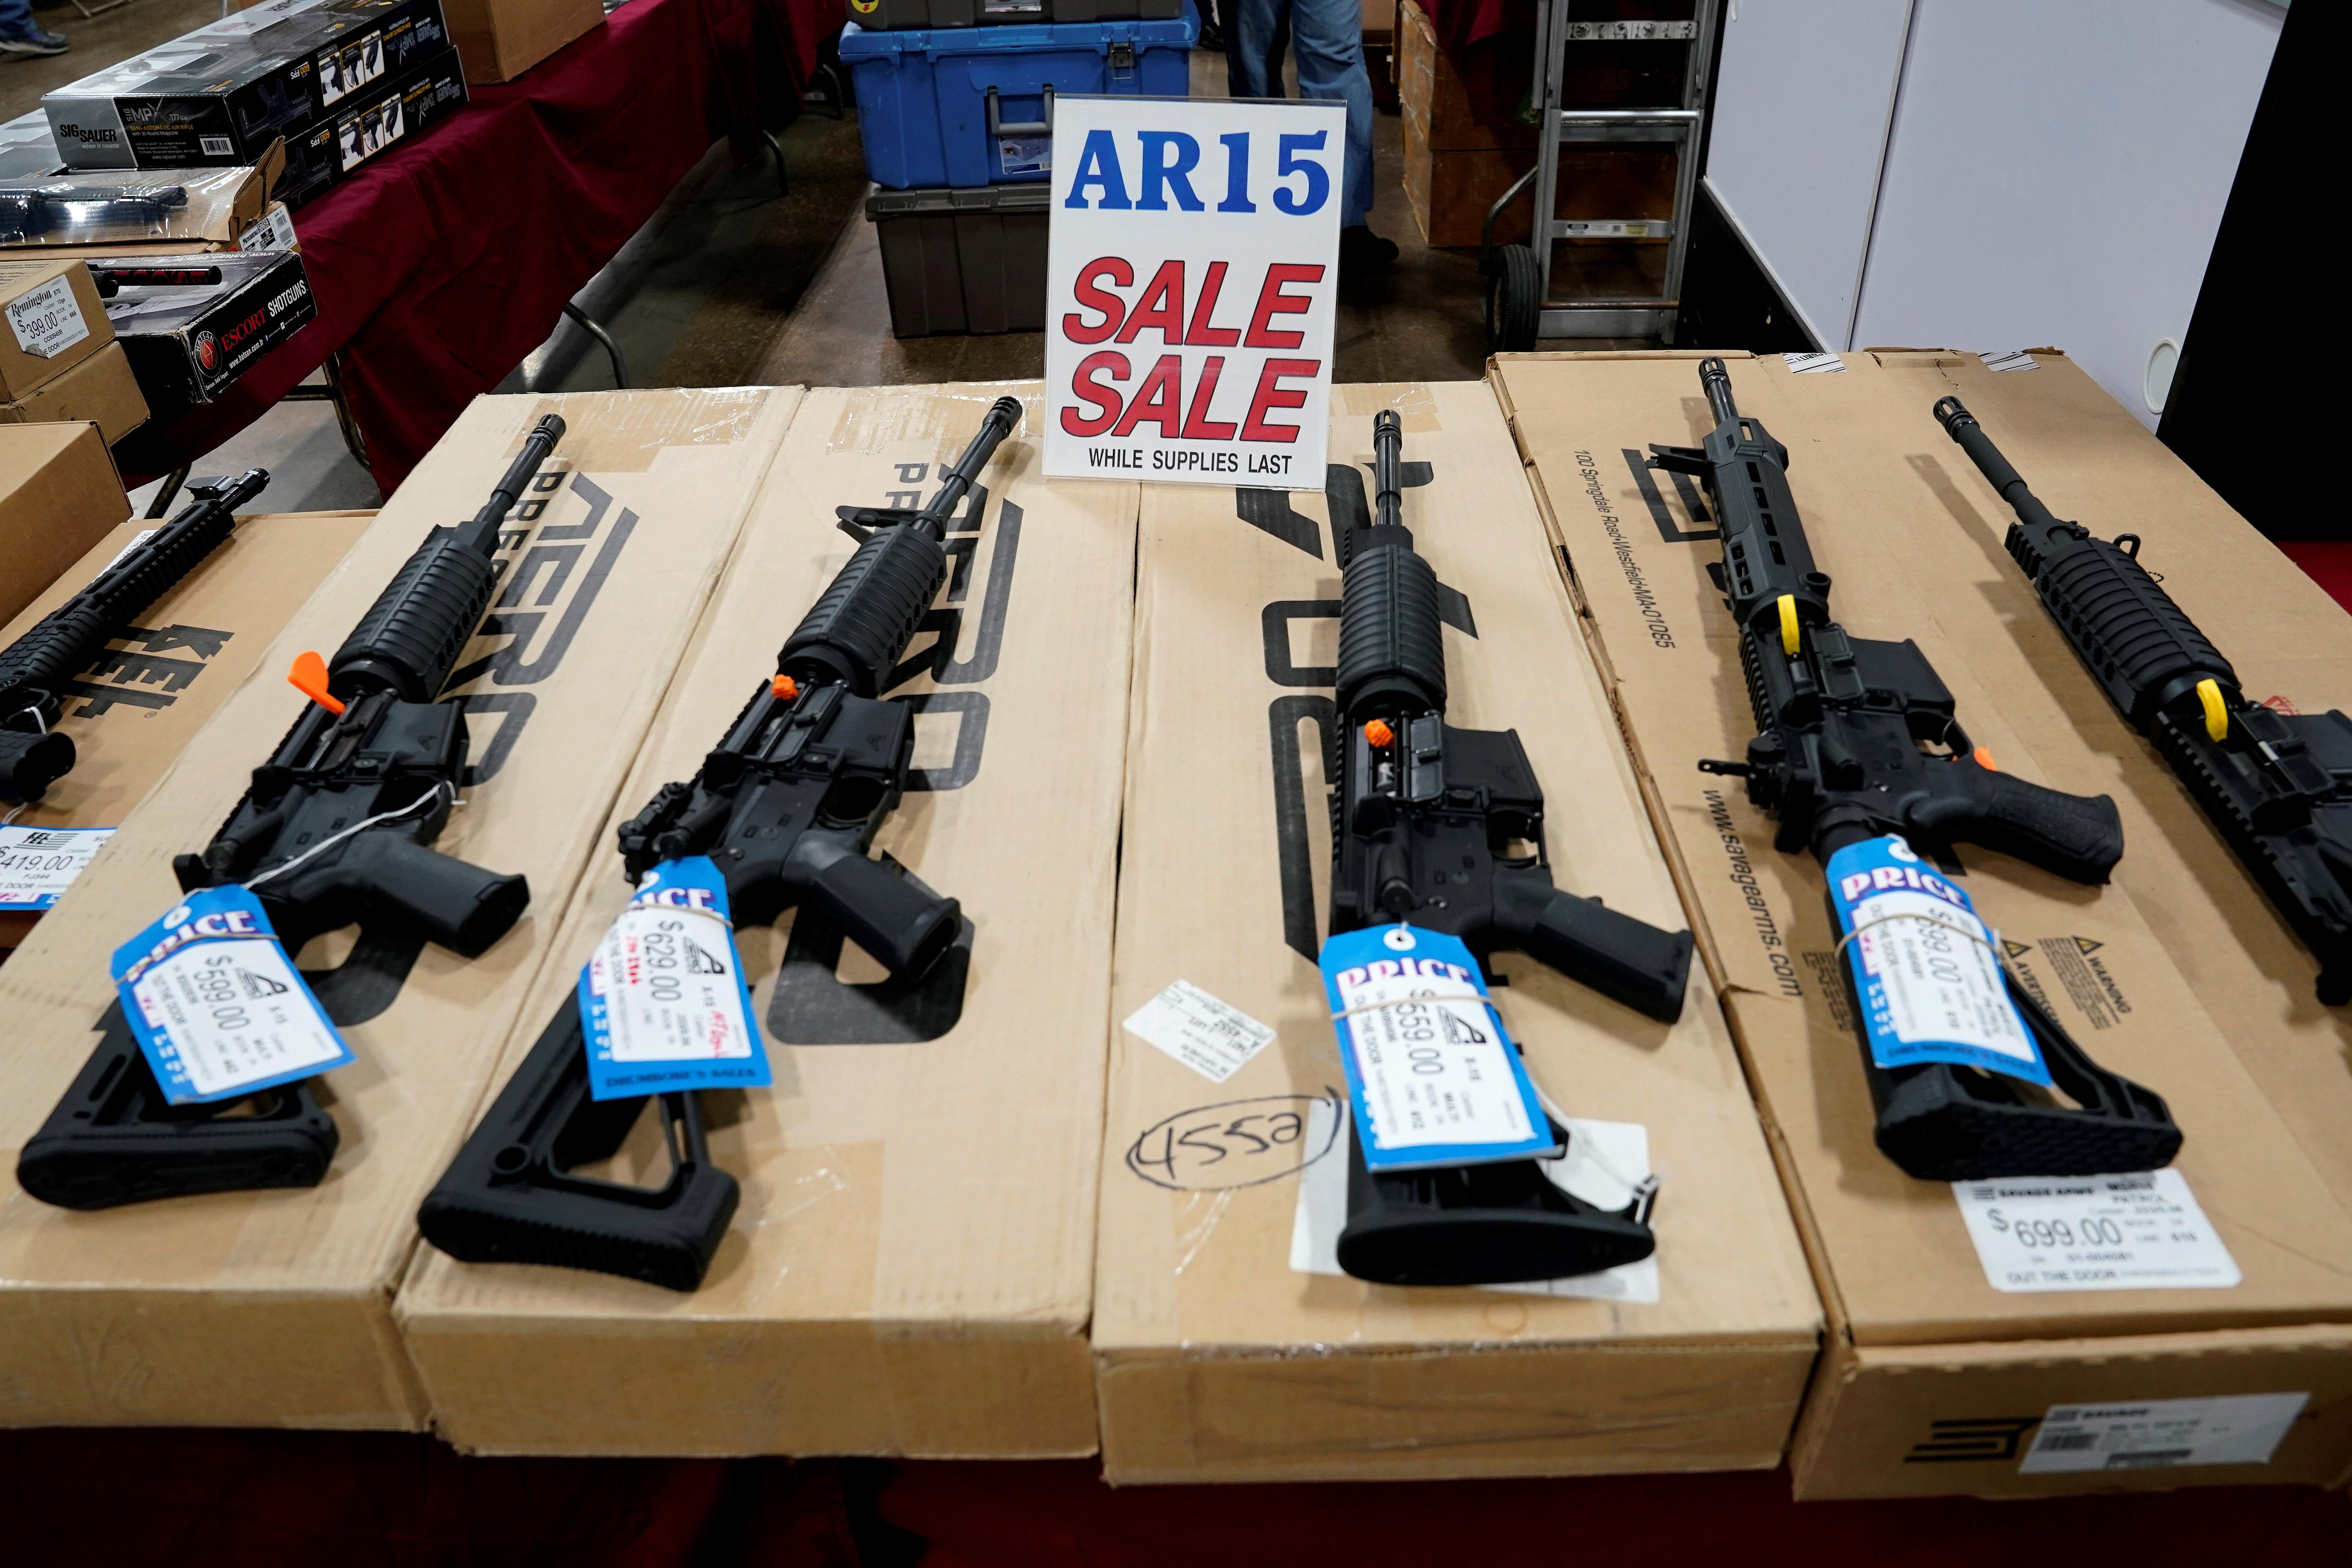 AR-15 rifles are displayed for sale at the Guntoberfest gun show in Oaks, Pennsylvania, U.S., October 6, 2017.   REUTERS/Joshua Roberts/File Photo